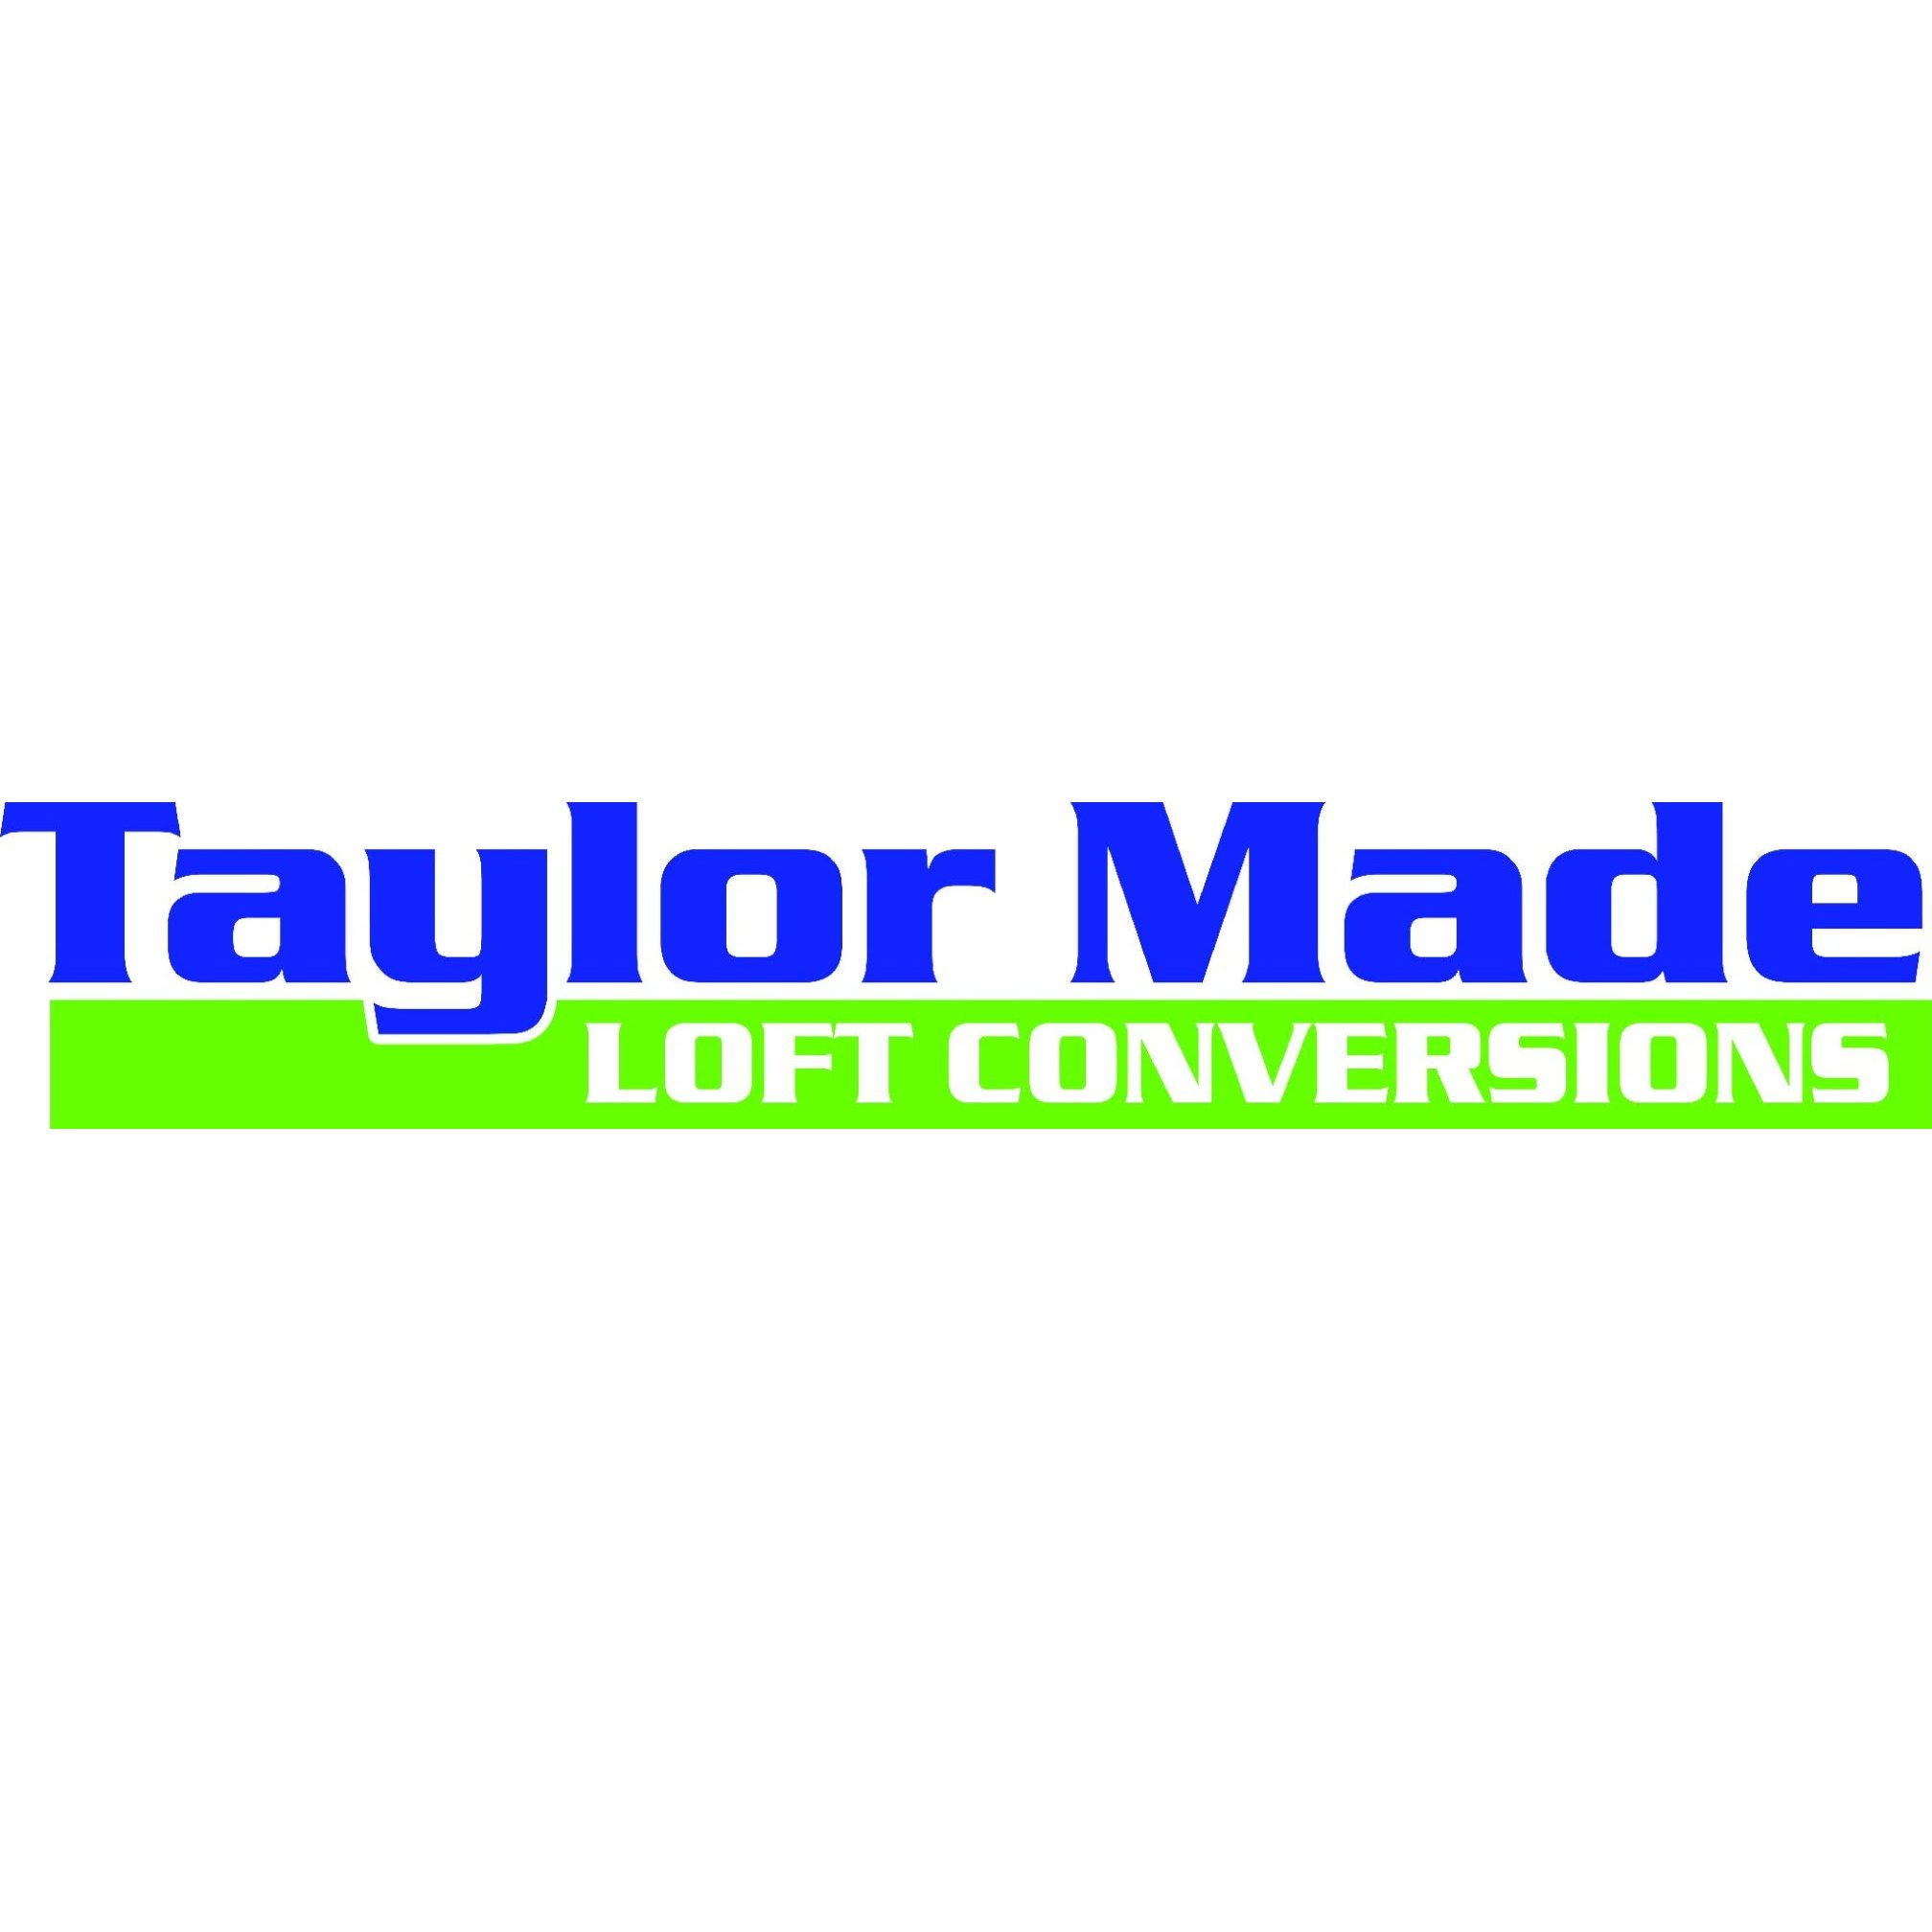 Taylor Made Loft Conversions Ltd - Worcester, Worcestershire WR8 0EA - 01684 310760 | ShowMeLocal.com